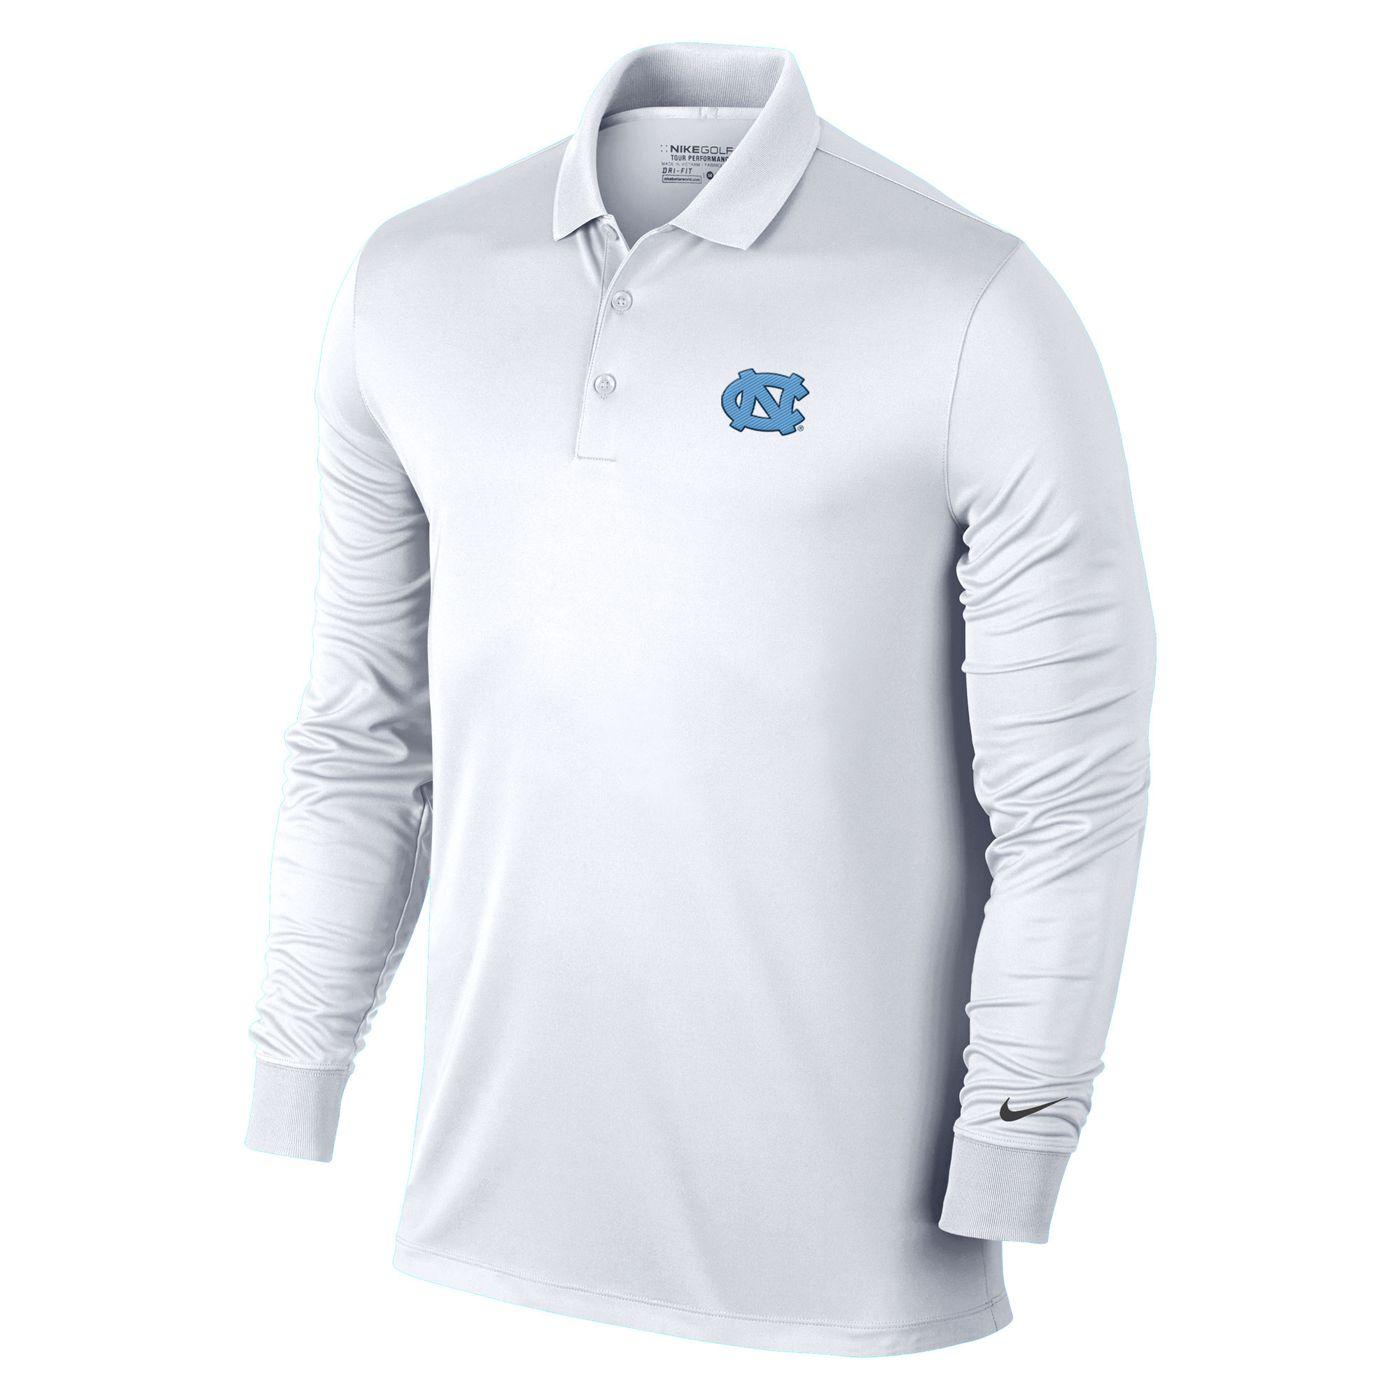 Johnny T Shirt North Carolina Tar Heels Nike Long Sleeve Victory